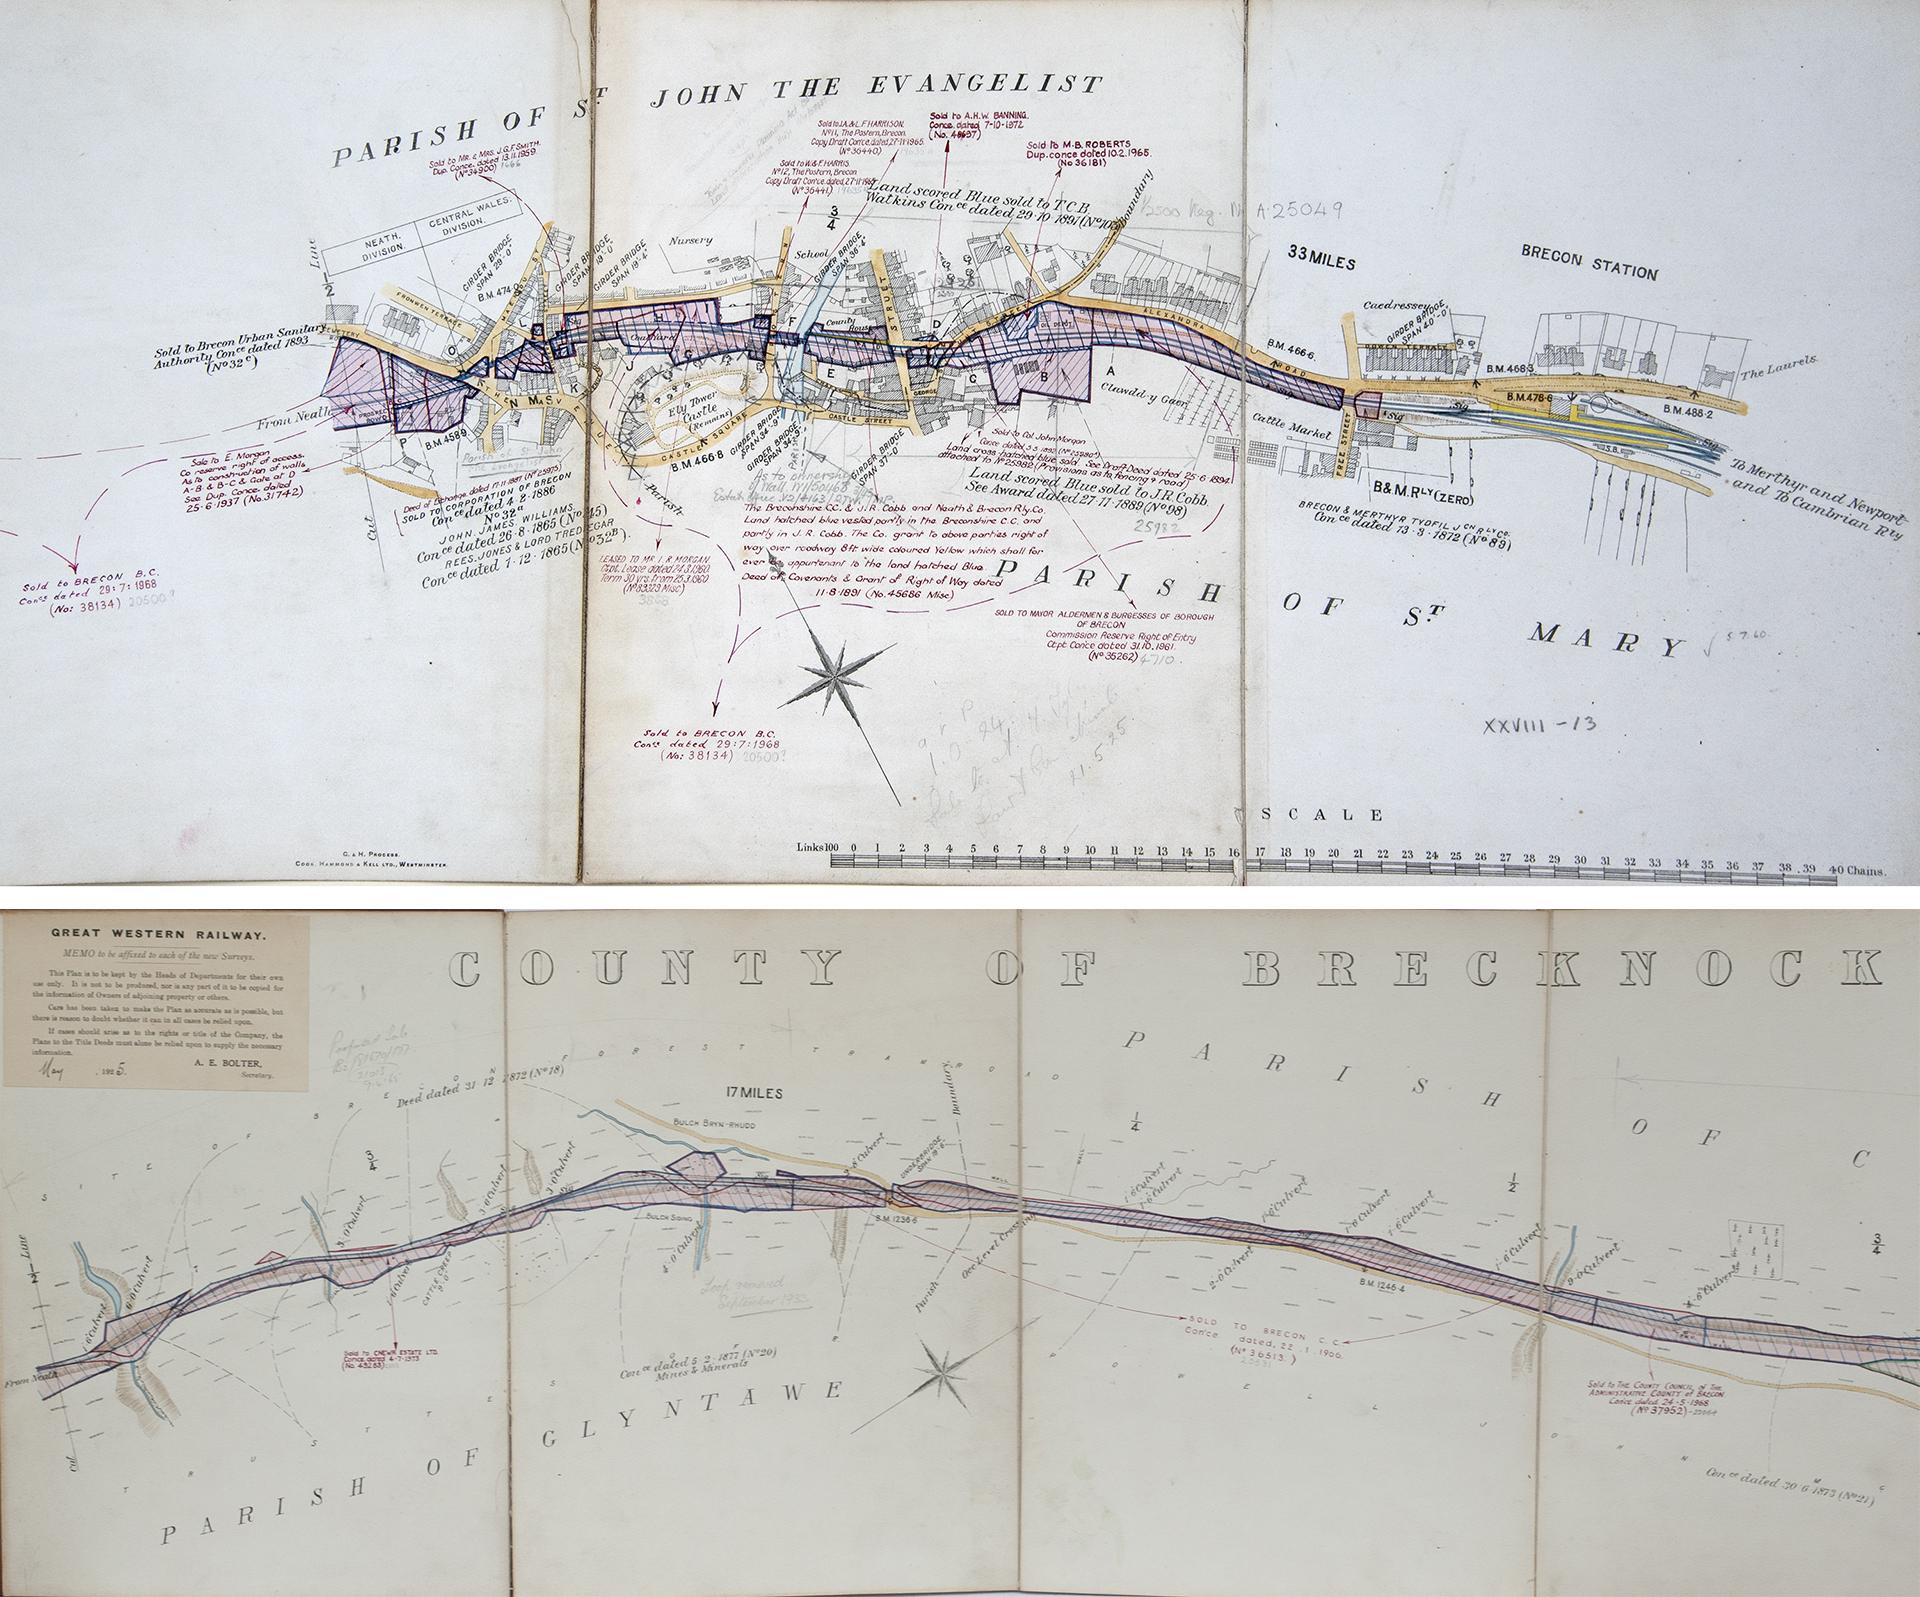 Neath And Brecon Railway Great Western Railway